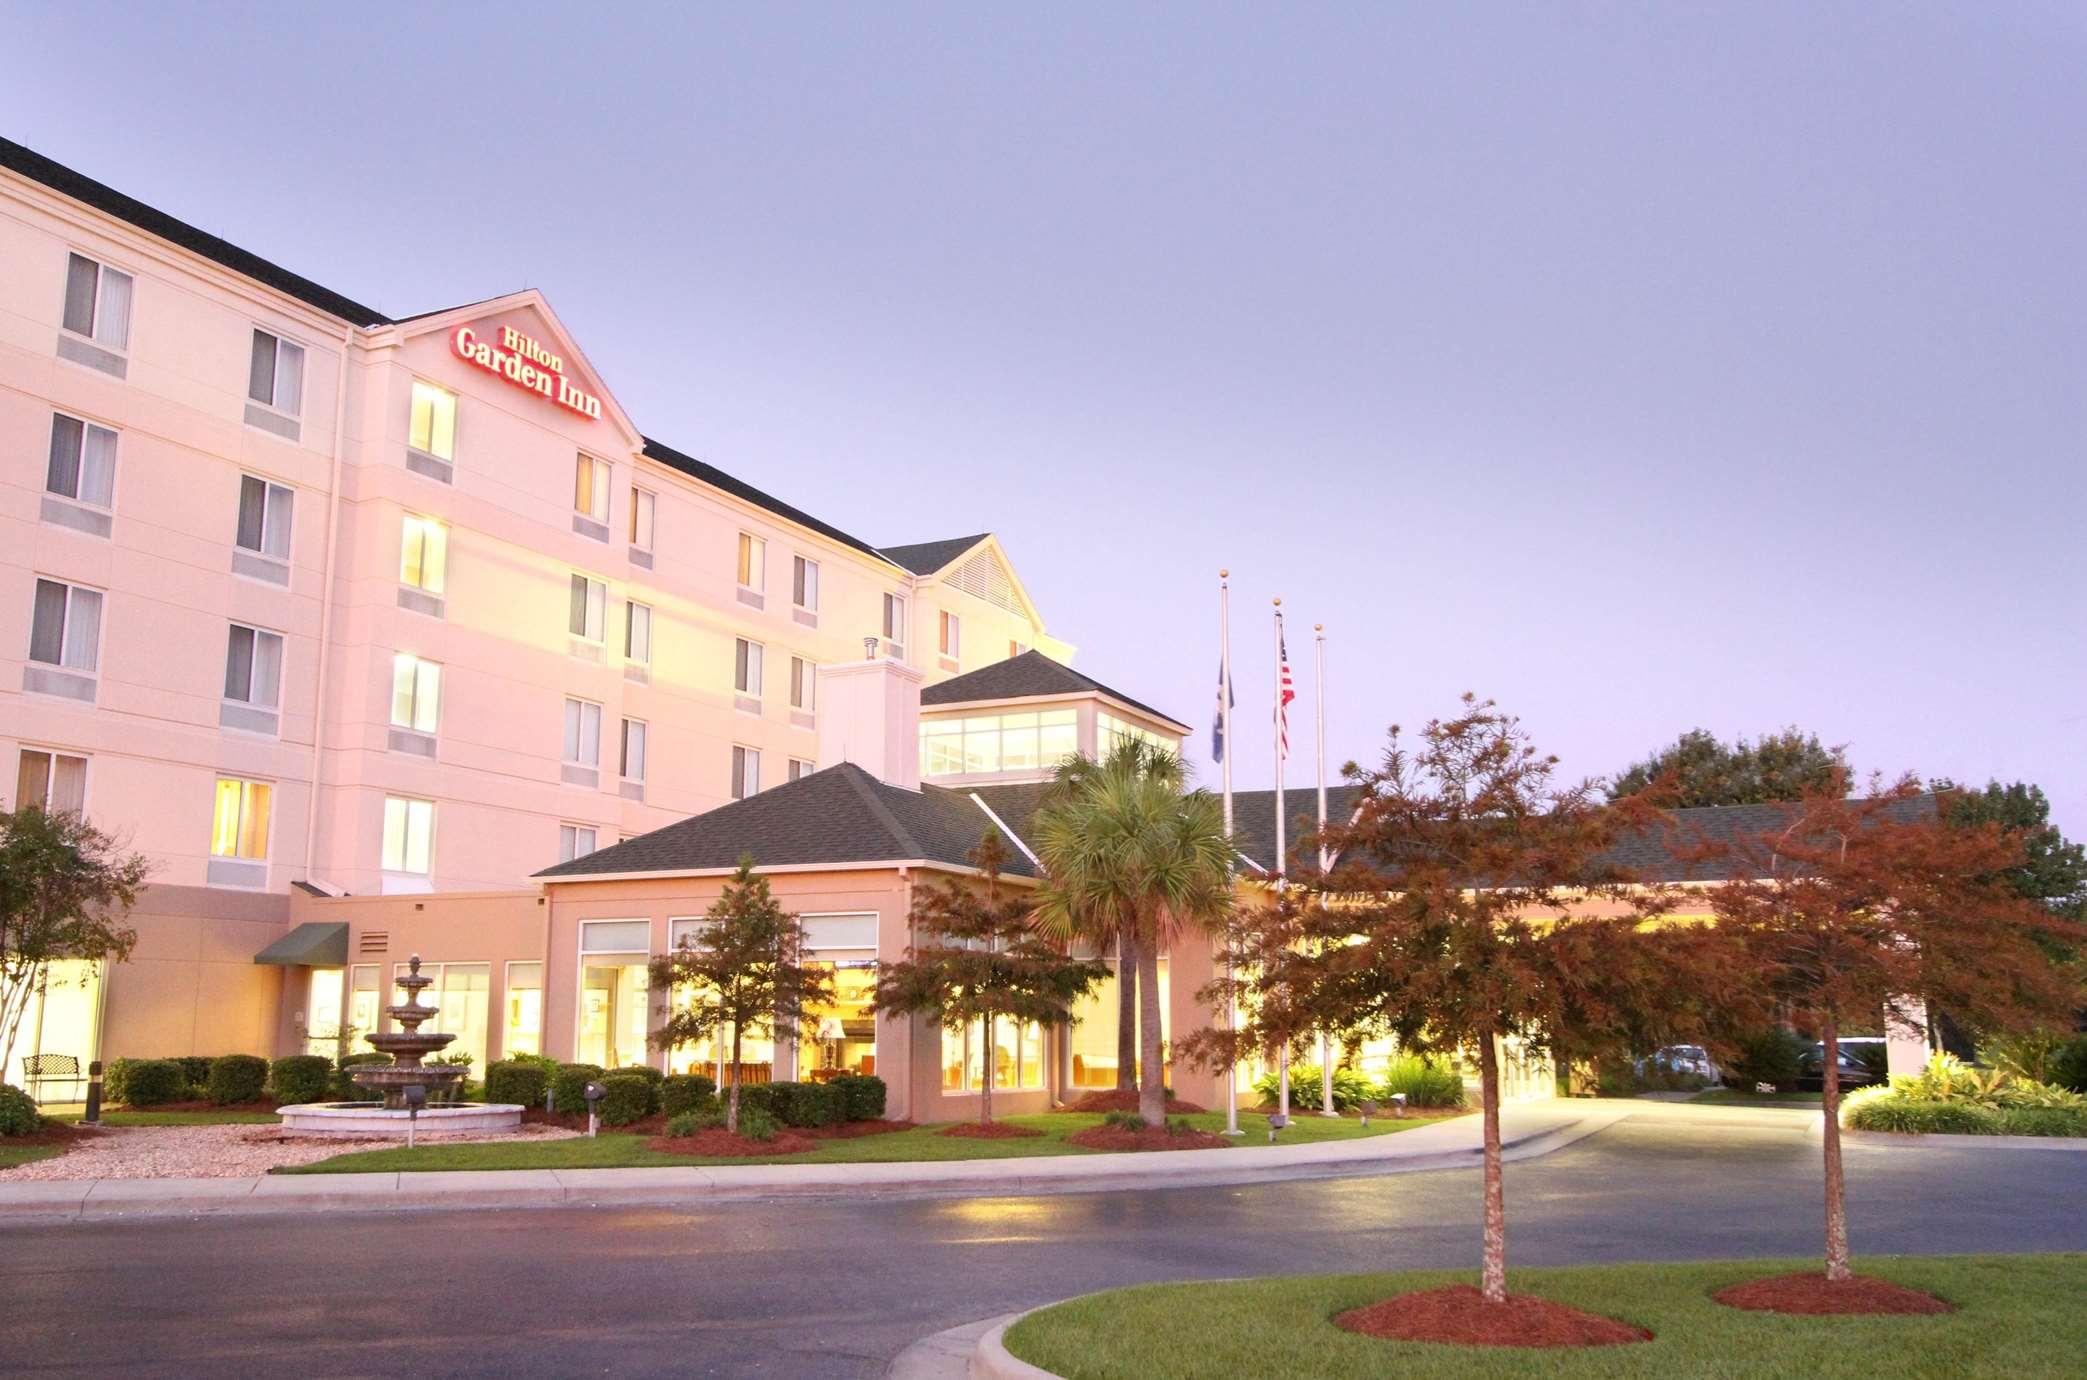 Hilton Garden Inn Baton Rouge Airport image 0